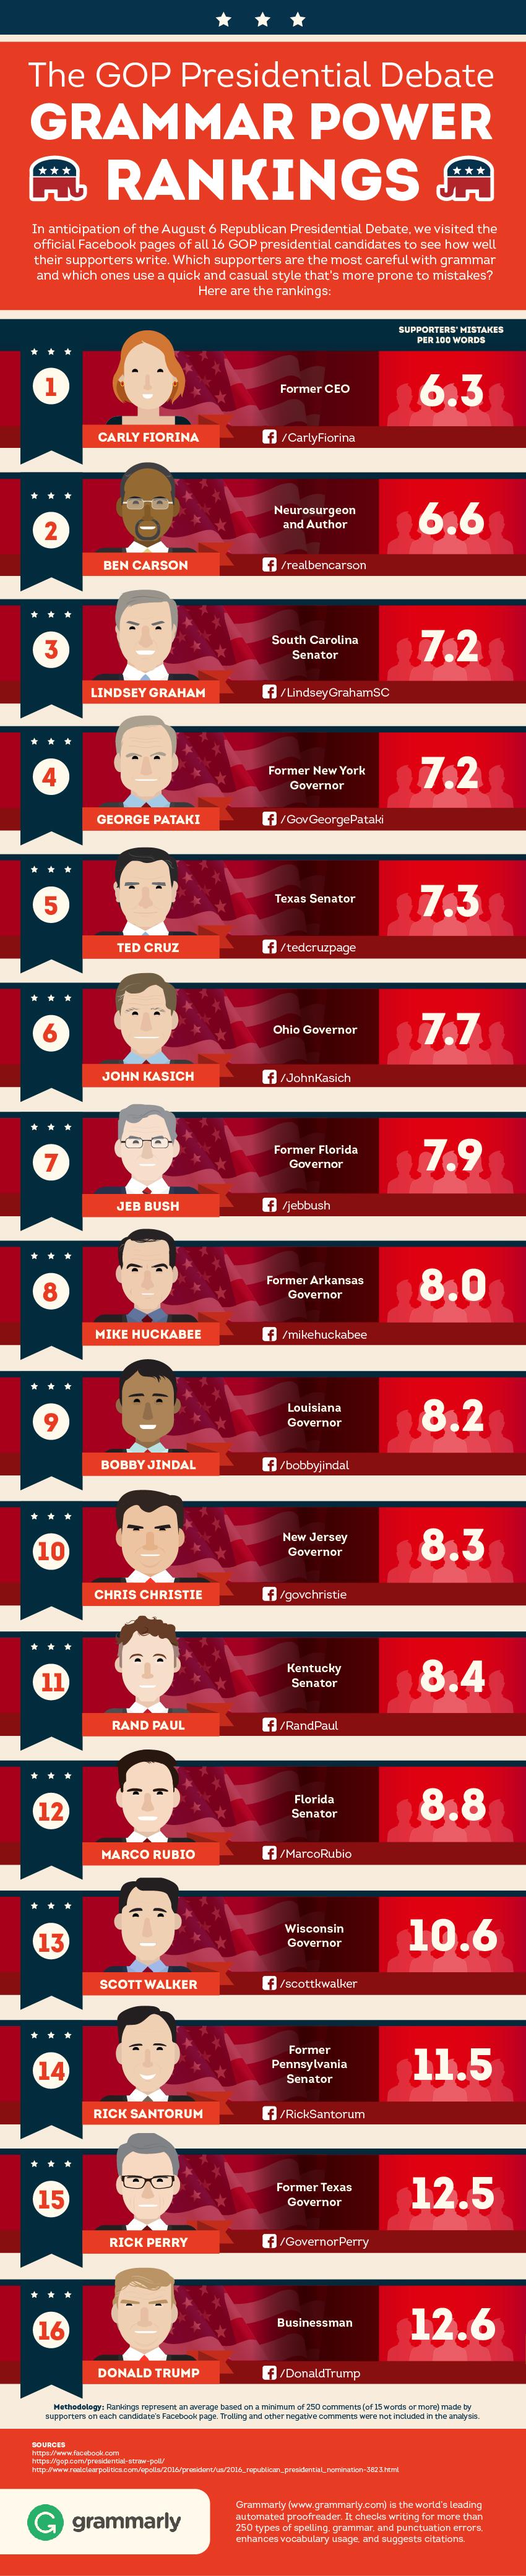 GOP Candidate Grammar Power Rankings